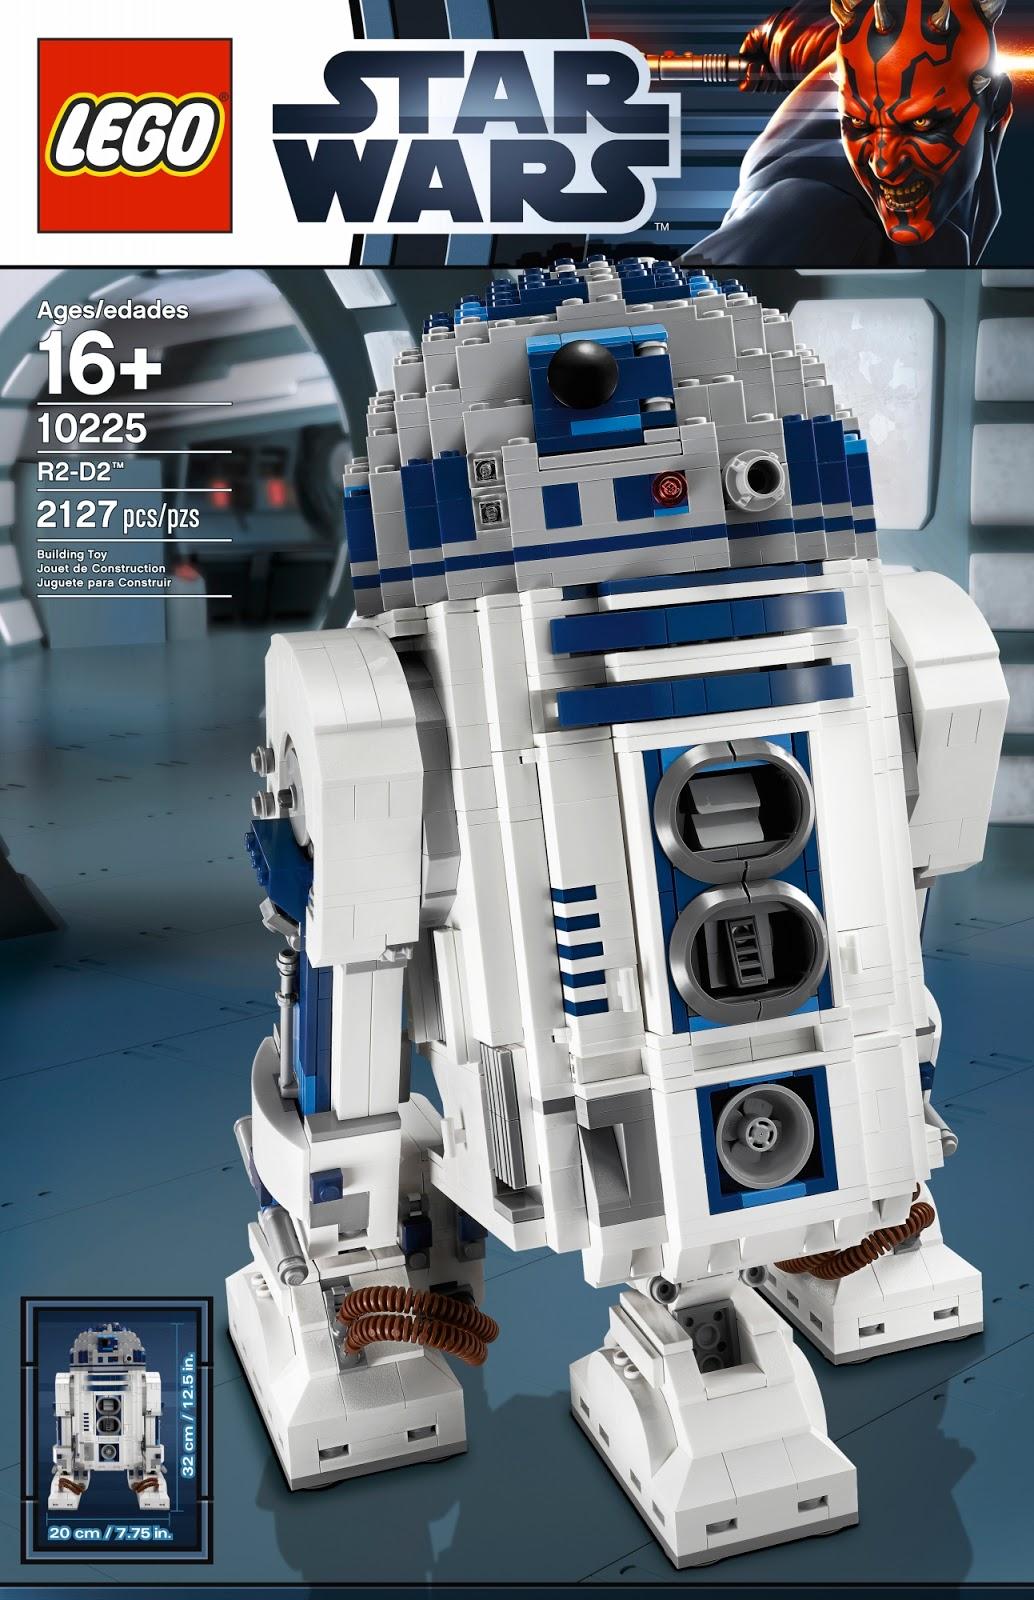 My favourite upcoming star wars lego ucs r2 d2 10225 set - Lego starwars r2d2 ...